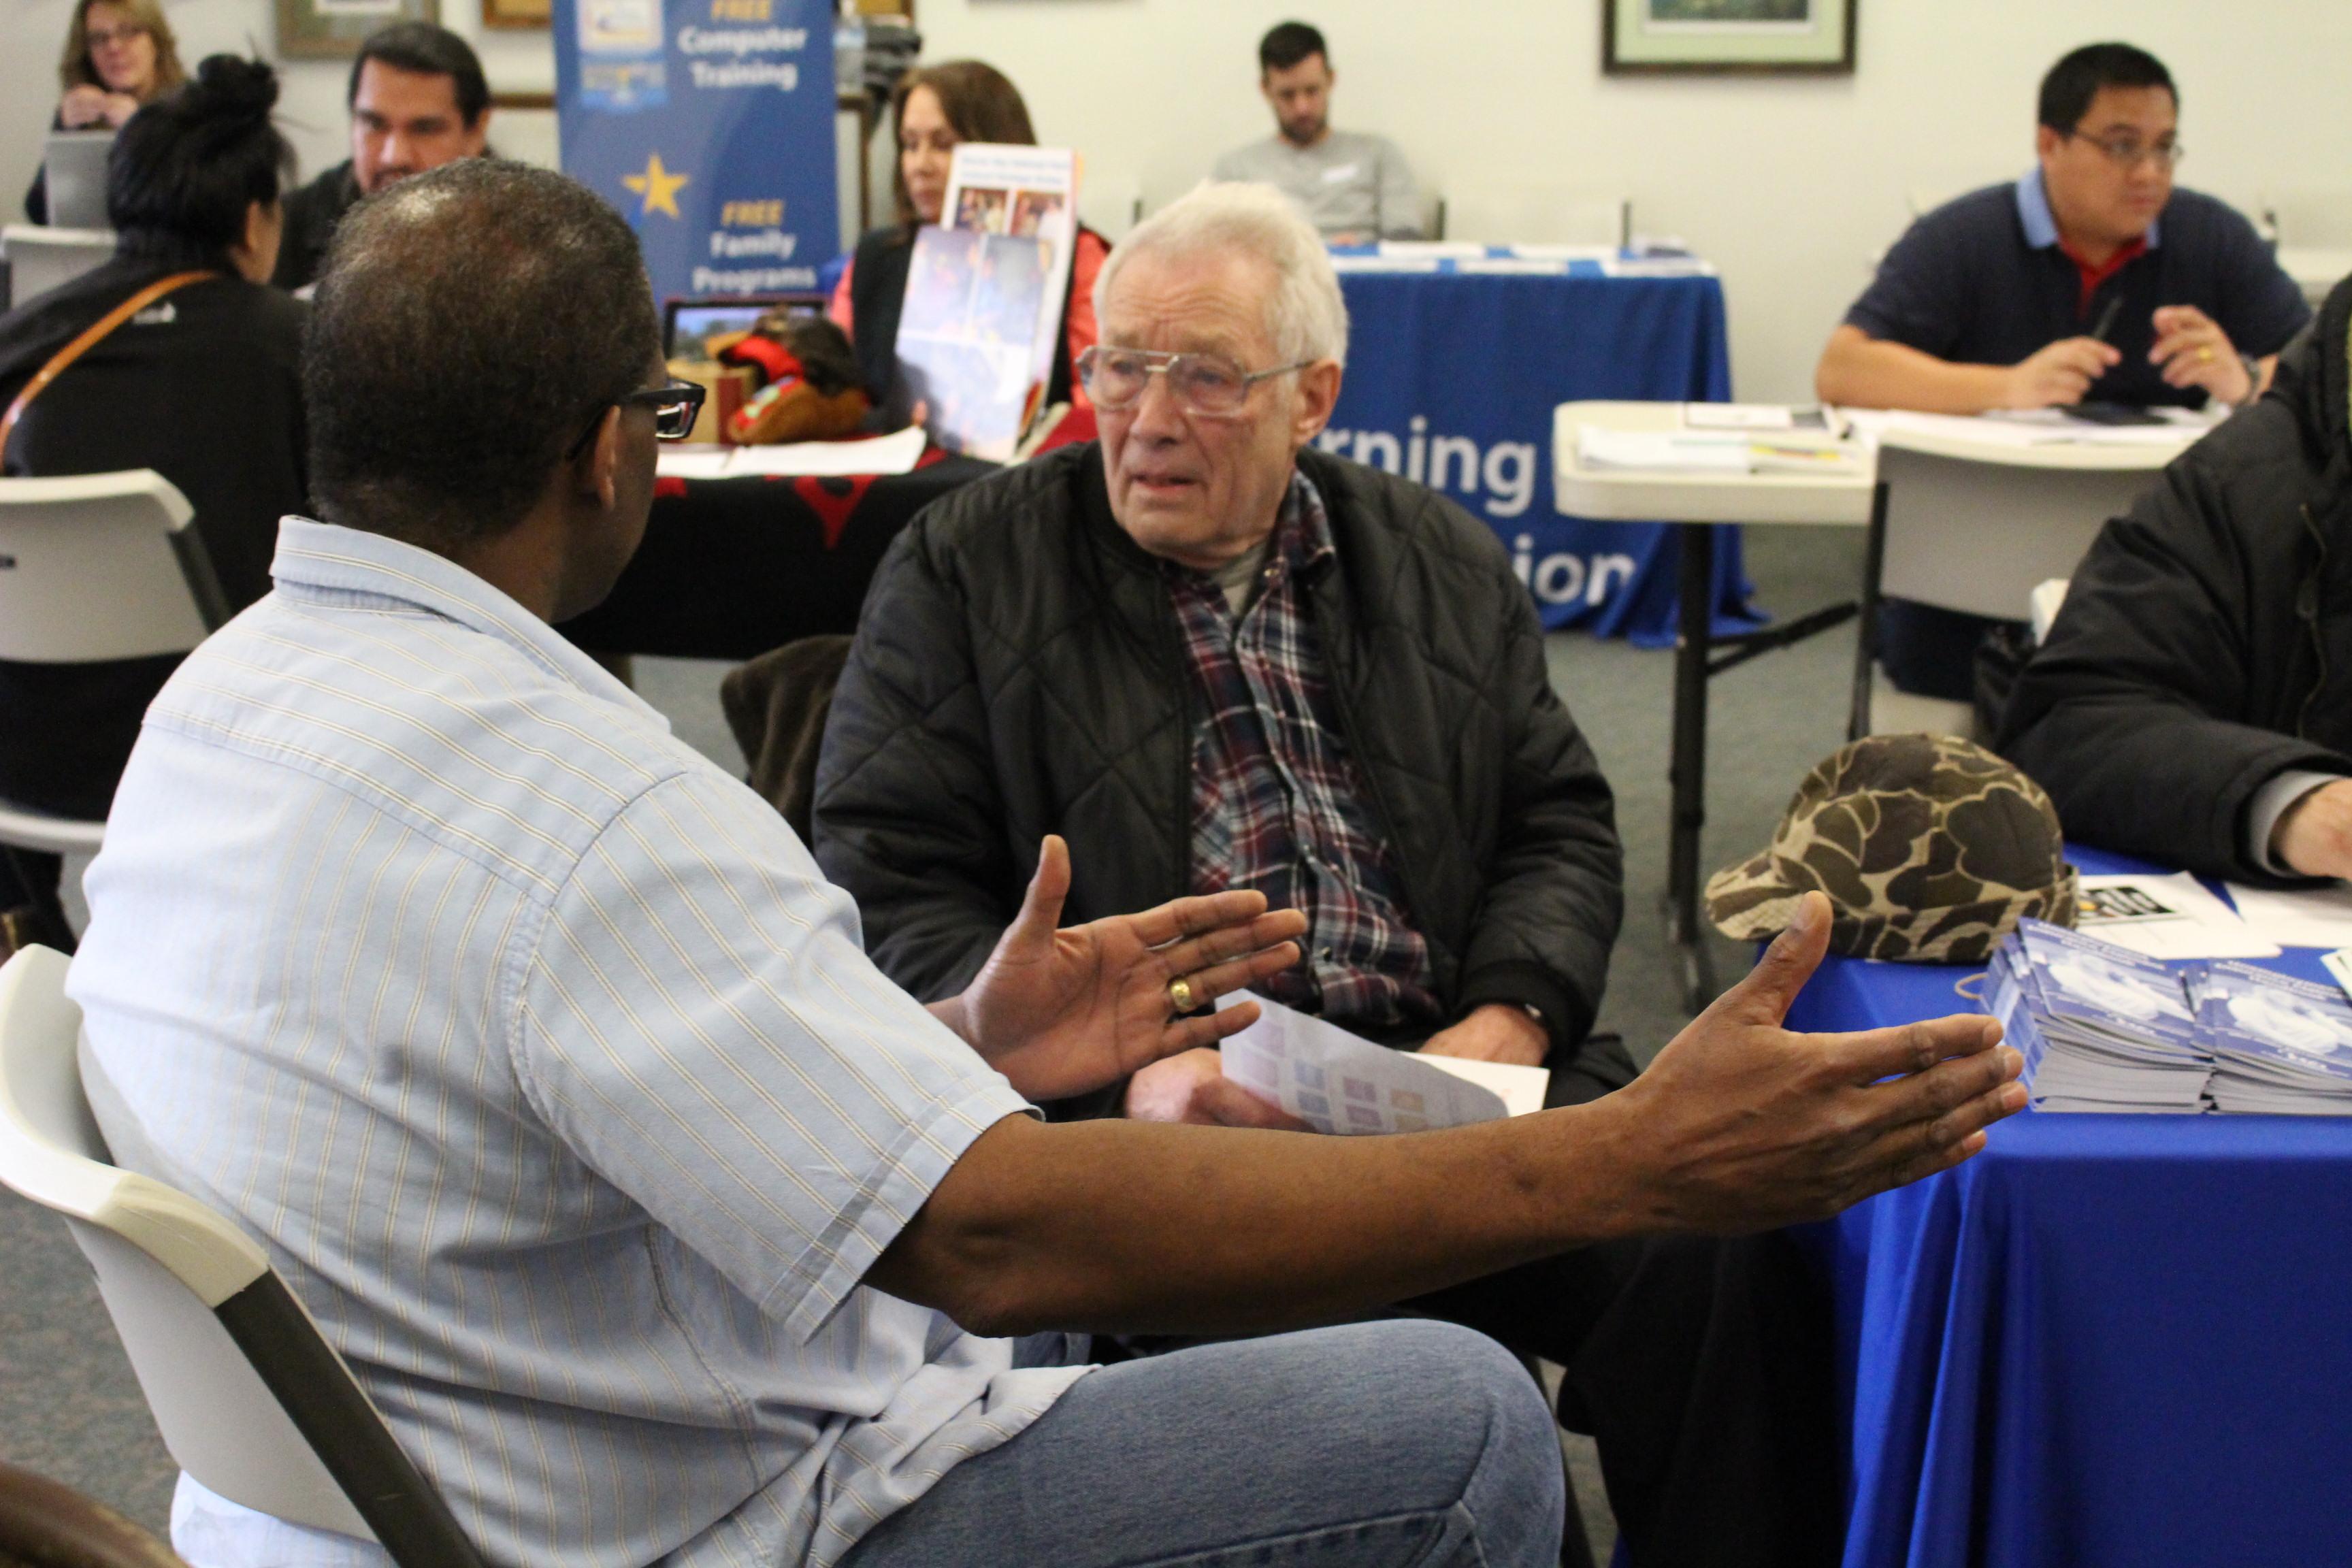 A Wal-Mart employee talks to the Juneau Job Center. (Photo by Elizabeth Jenkins/KTOO)